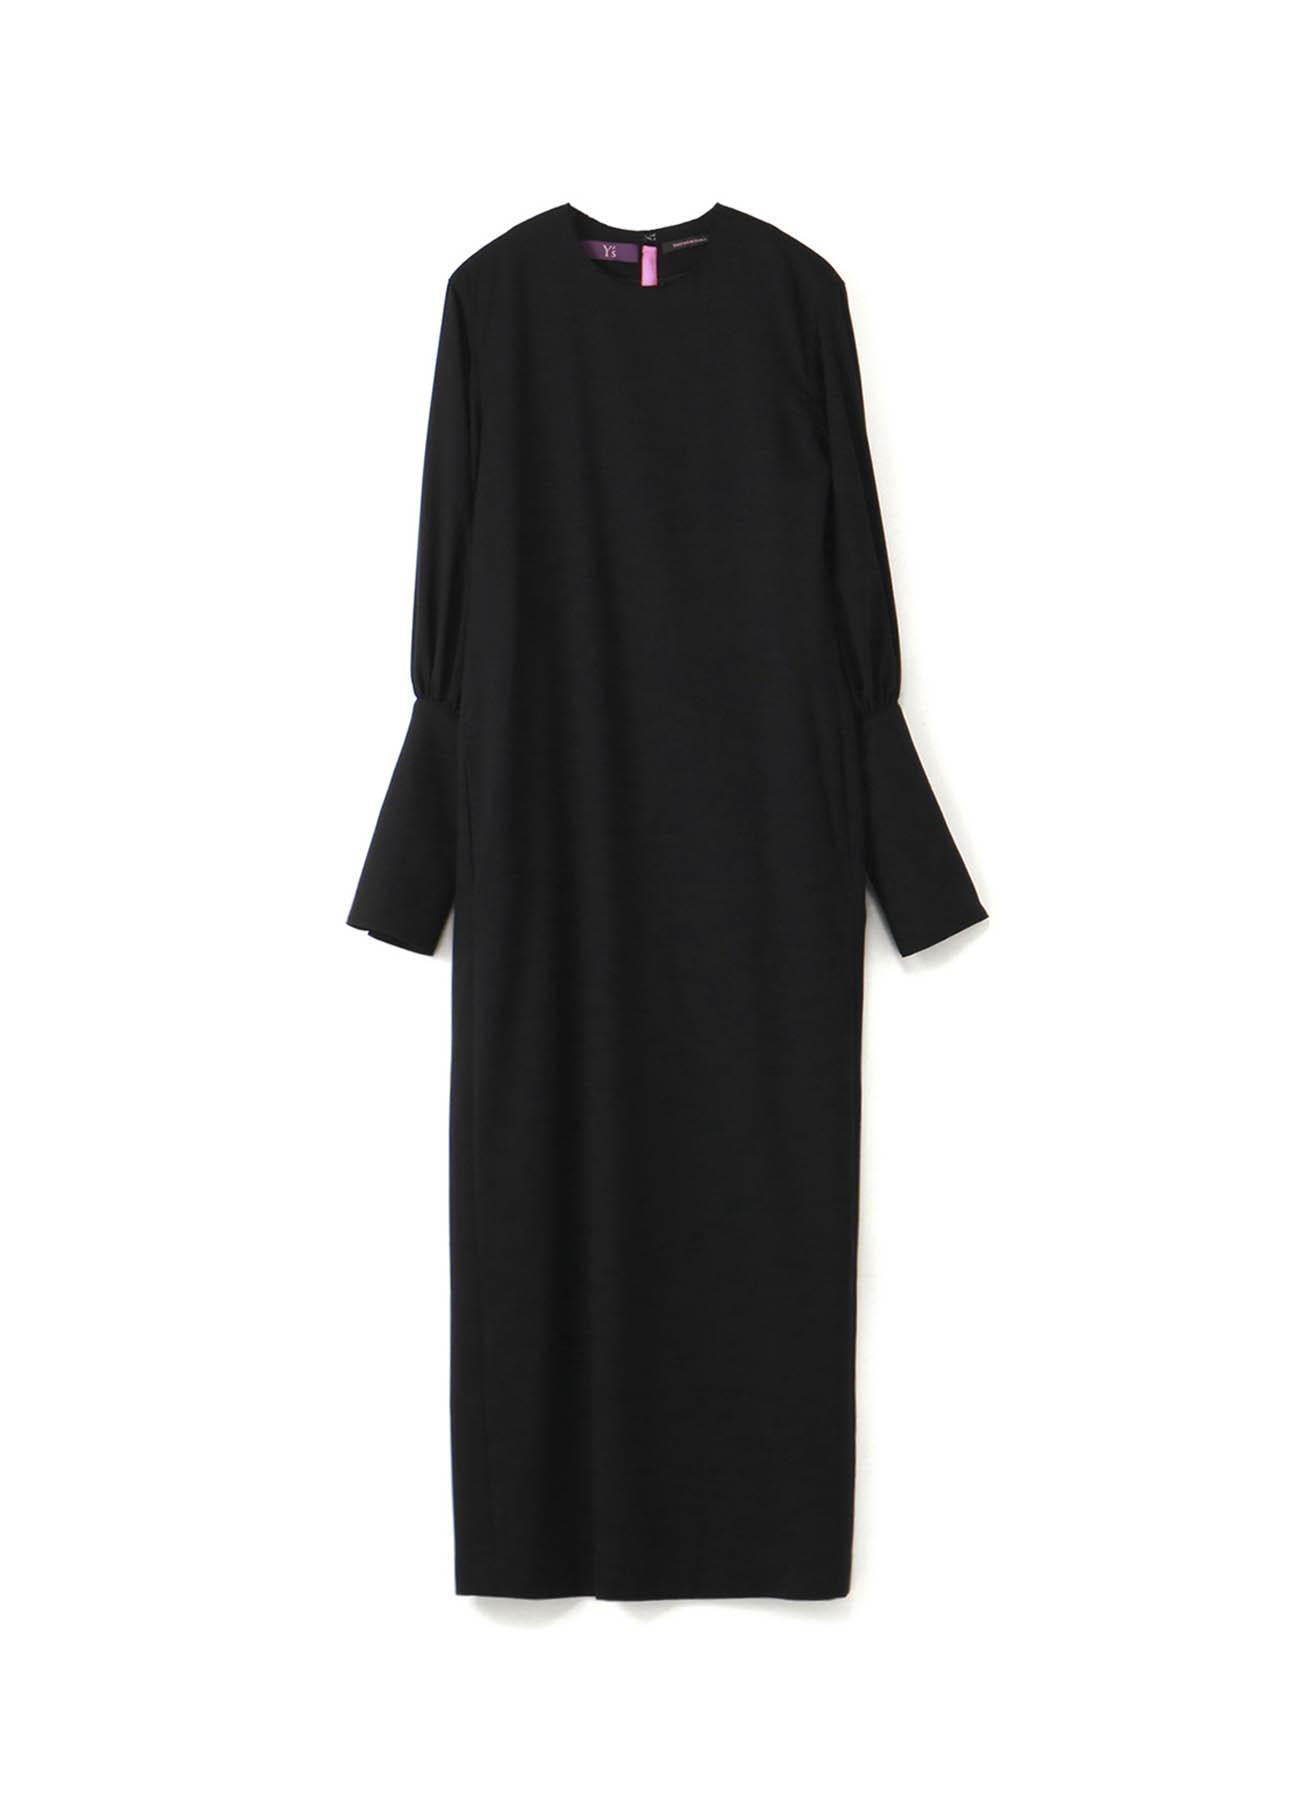 Y'sPINK GEORGETTE LONG DRESS